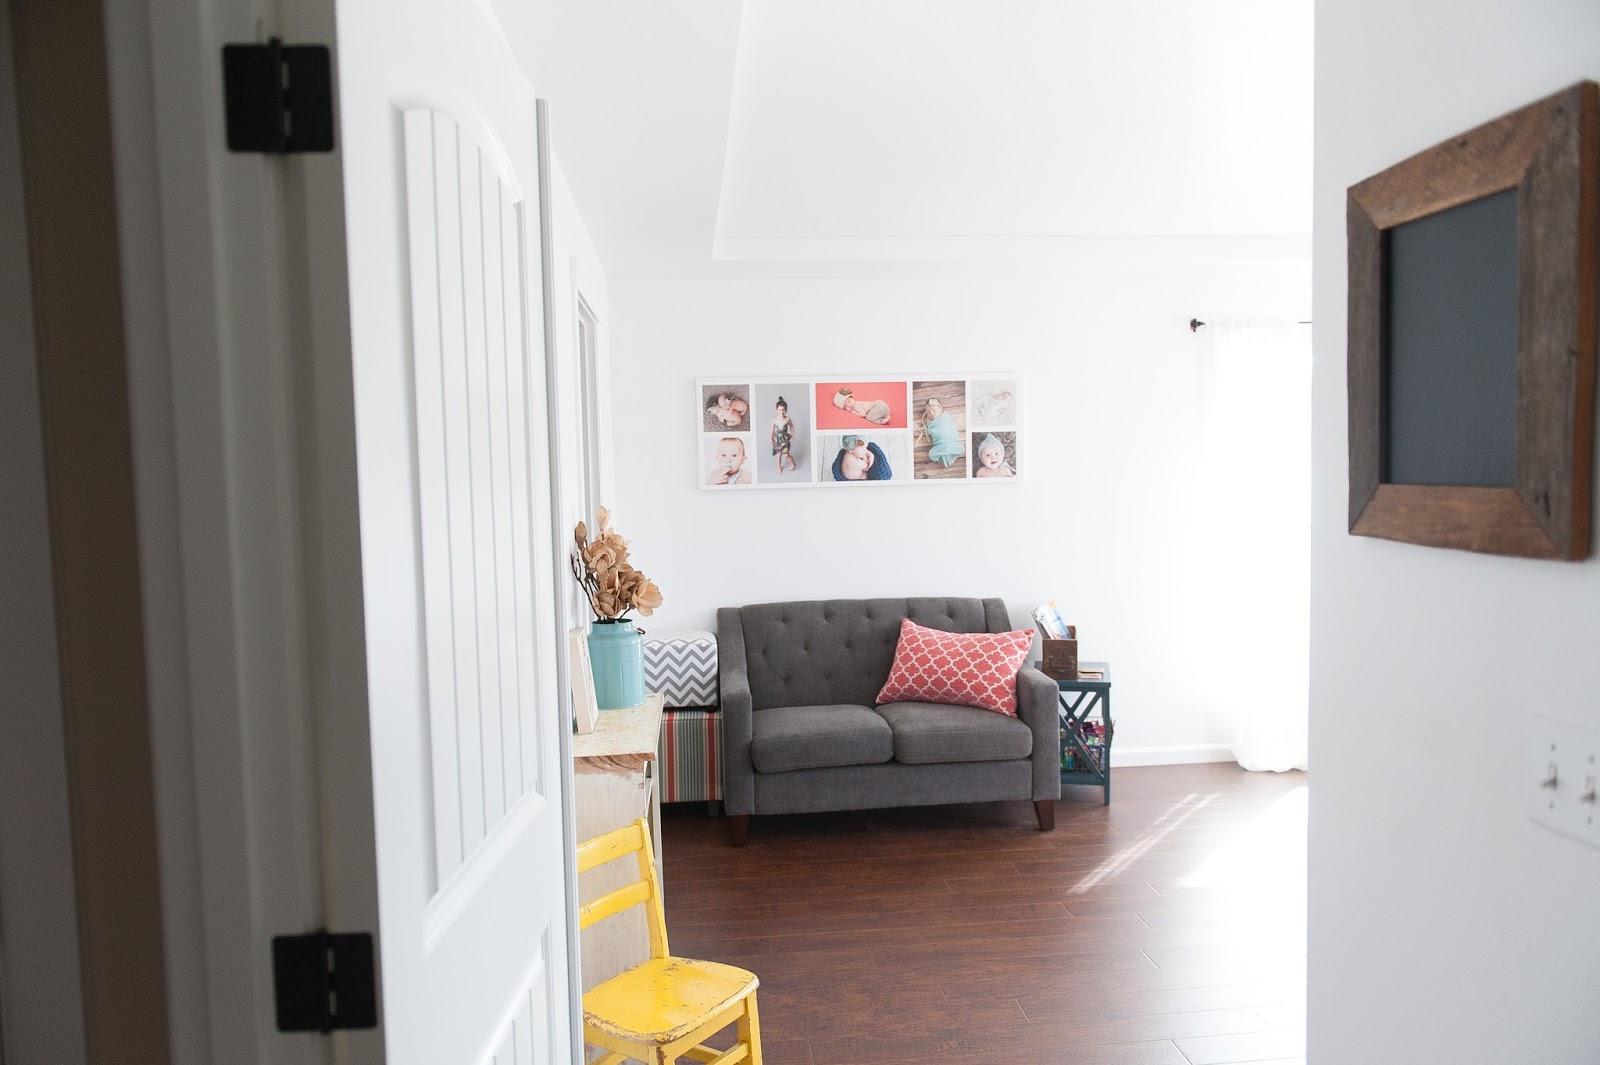 Studio Entry - Gray Love Seat, hardwood floors